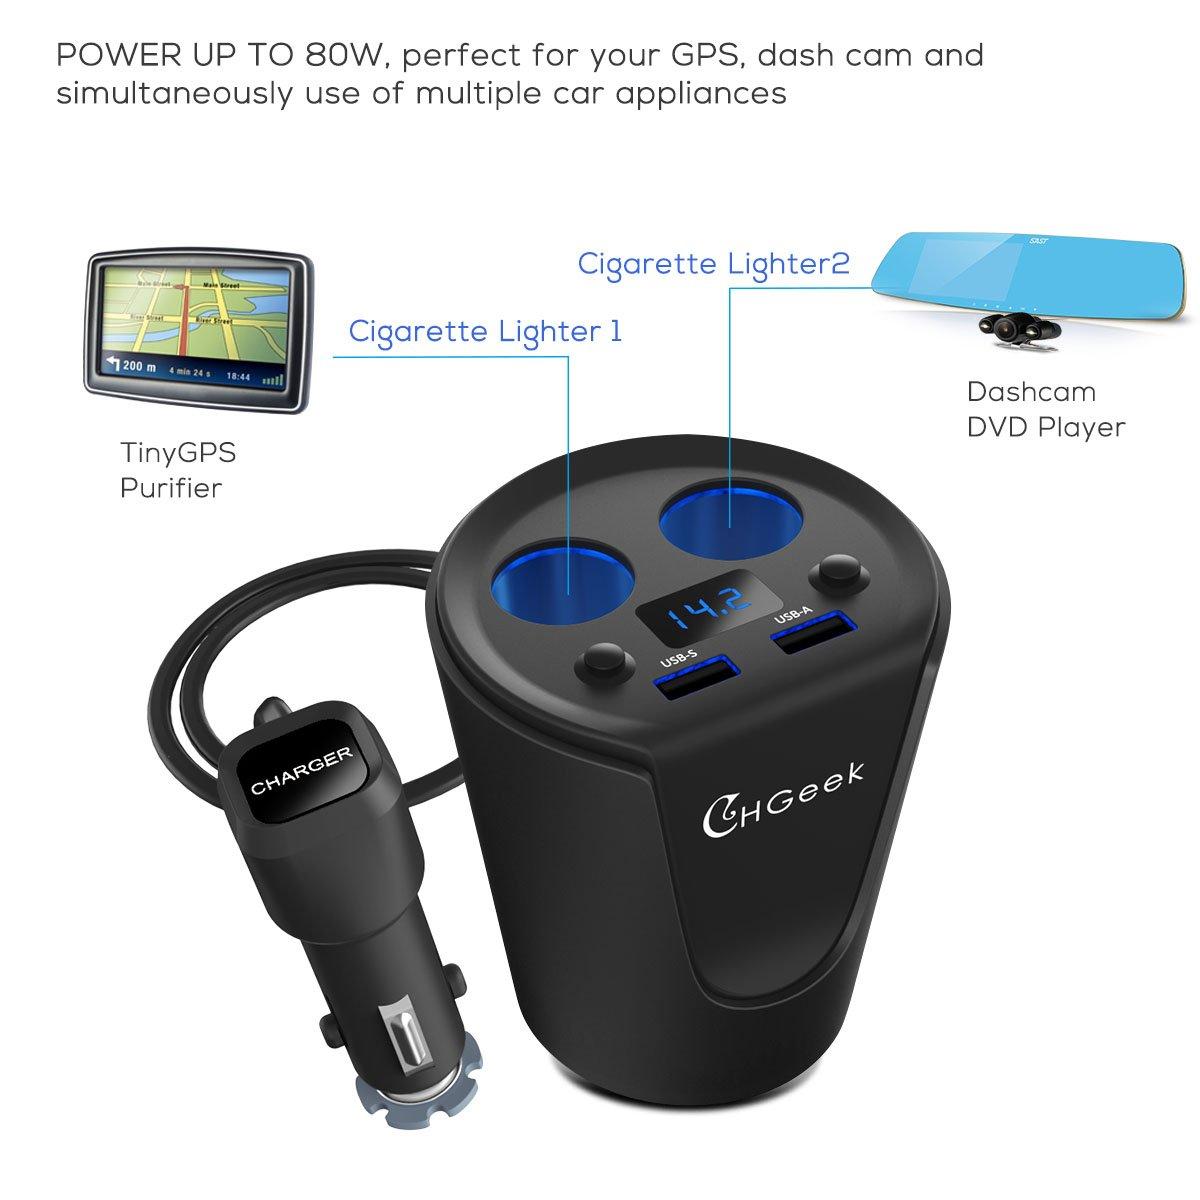 Tablets und Mehr CHGeek Auto Zigarettenanz/ünder Auto Ladeger/ät 80W 12V//24V 3.1A Dual USB KFZ Ladeger/ät Multi-Funktion Auto Adapter mit 2 Fach Auto Zigarettenanz/ünder Verteiler Ladeger/ät f/ür GPS